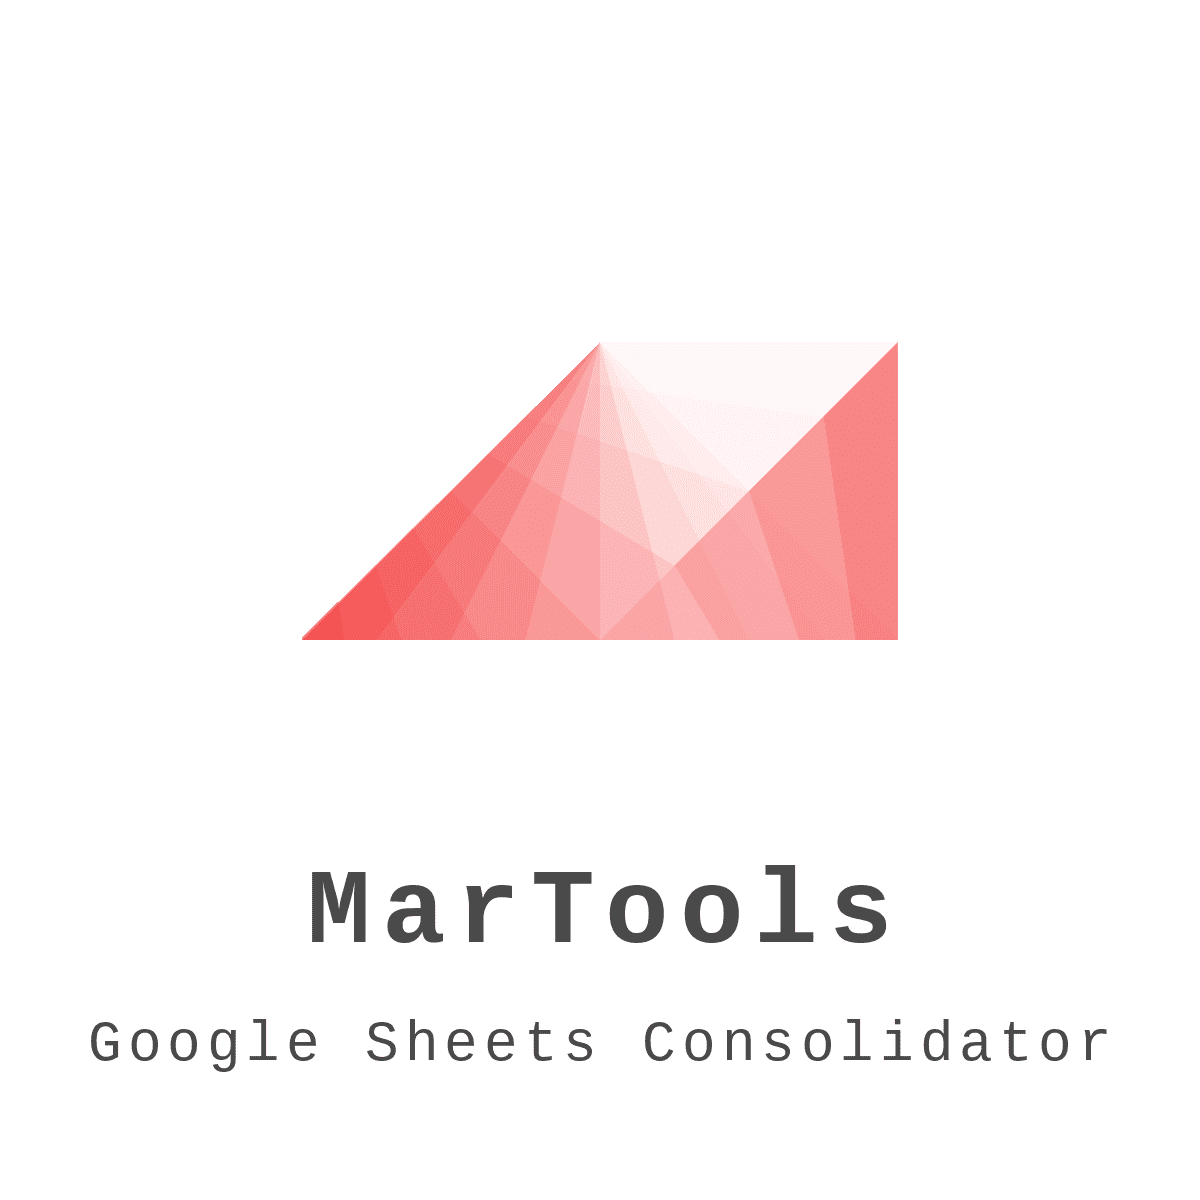 MarTools Consolidator Google Sheets Add-on